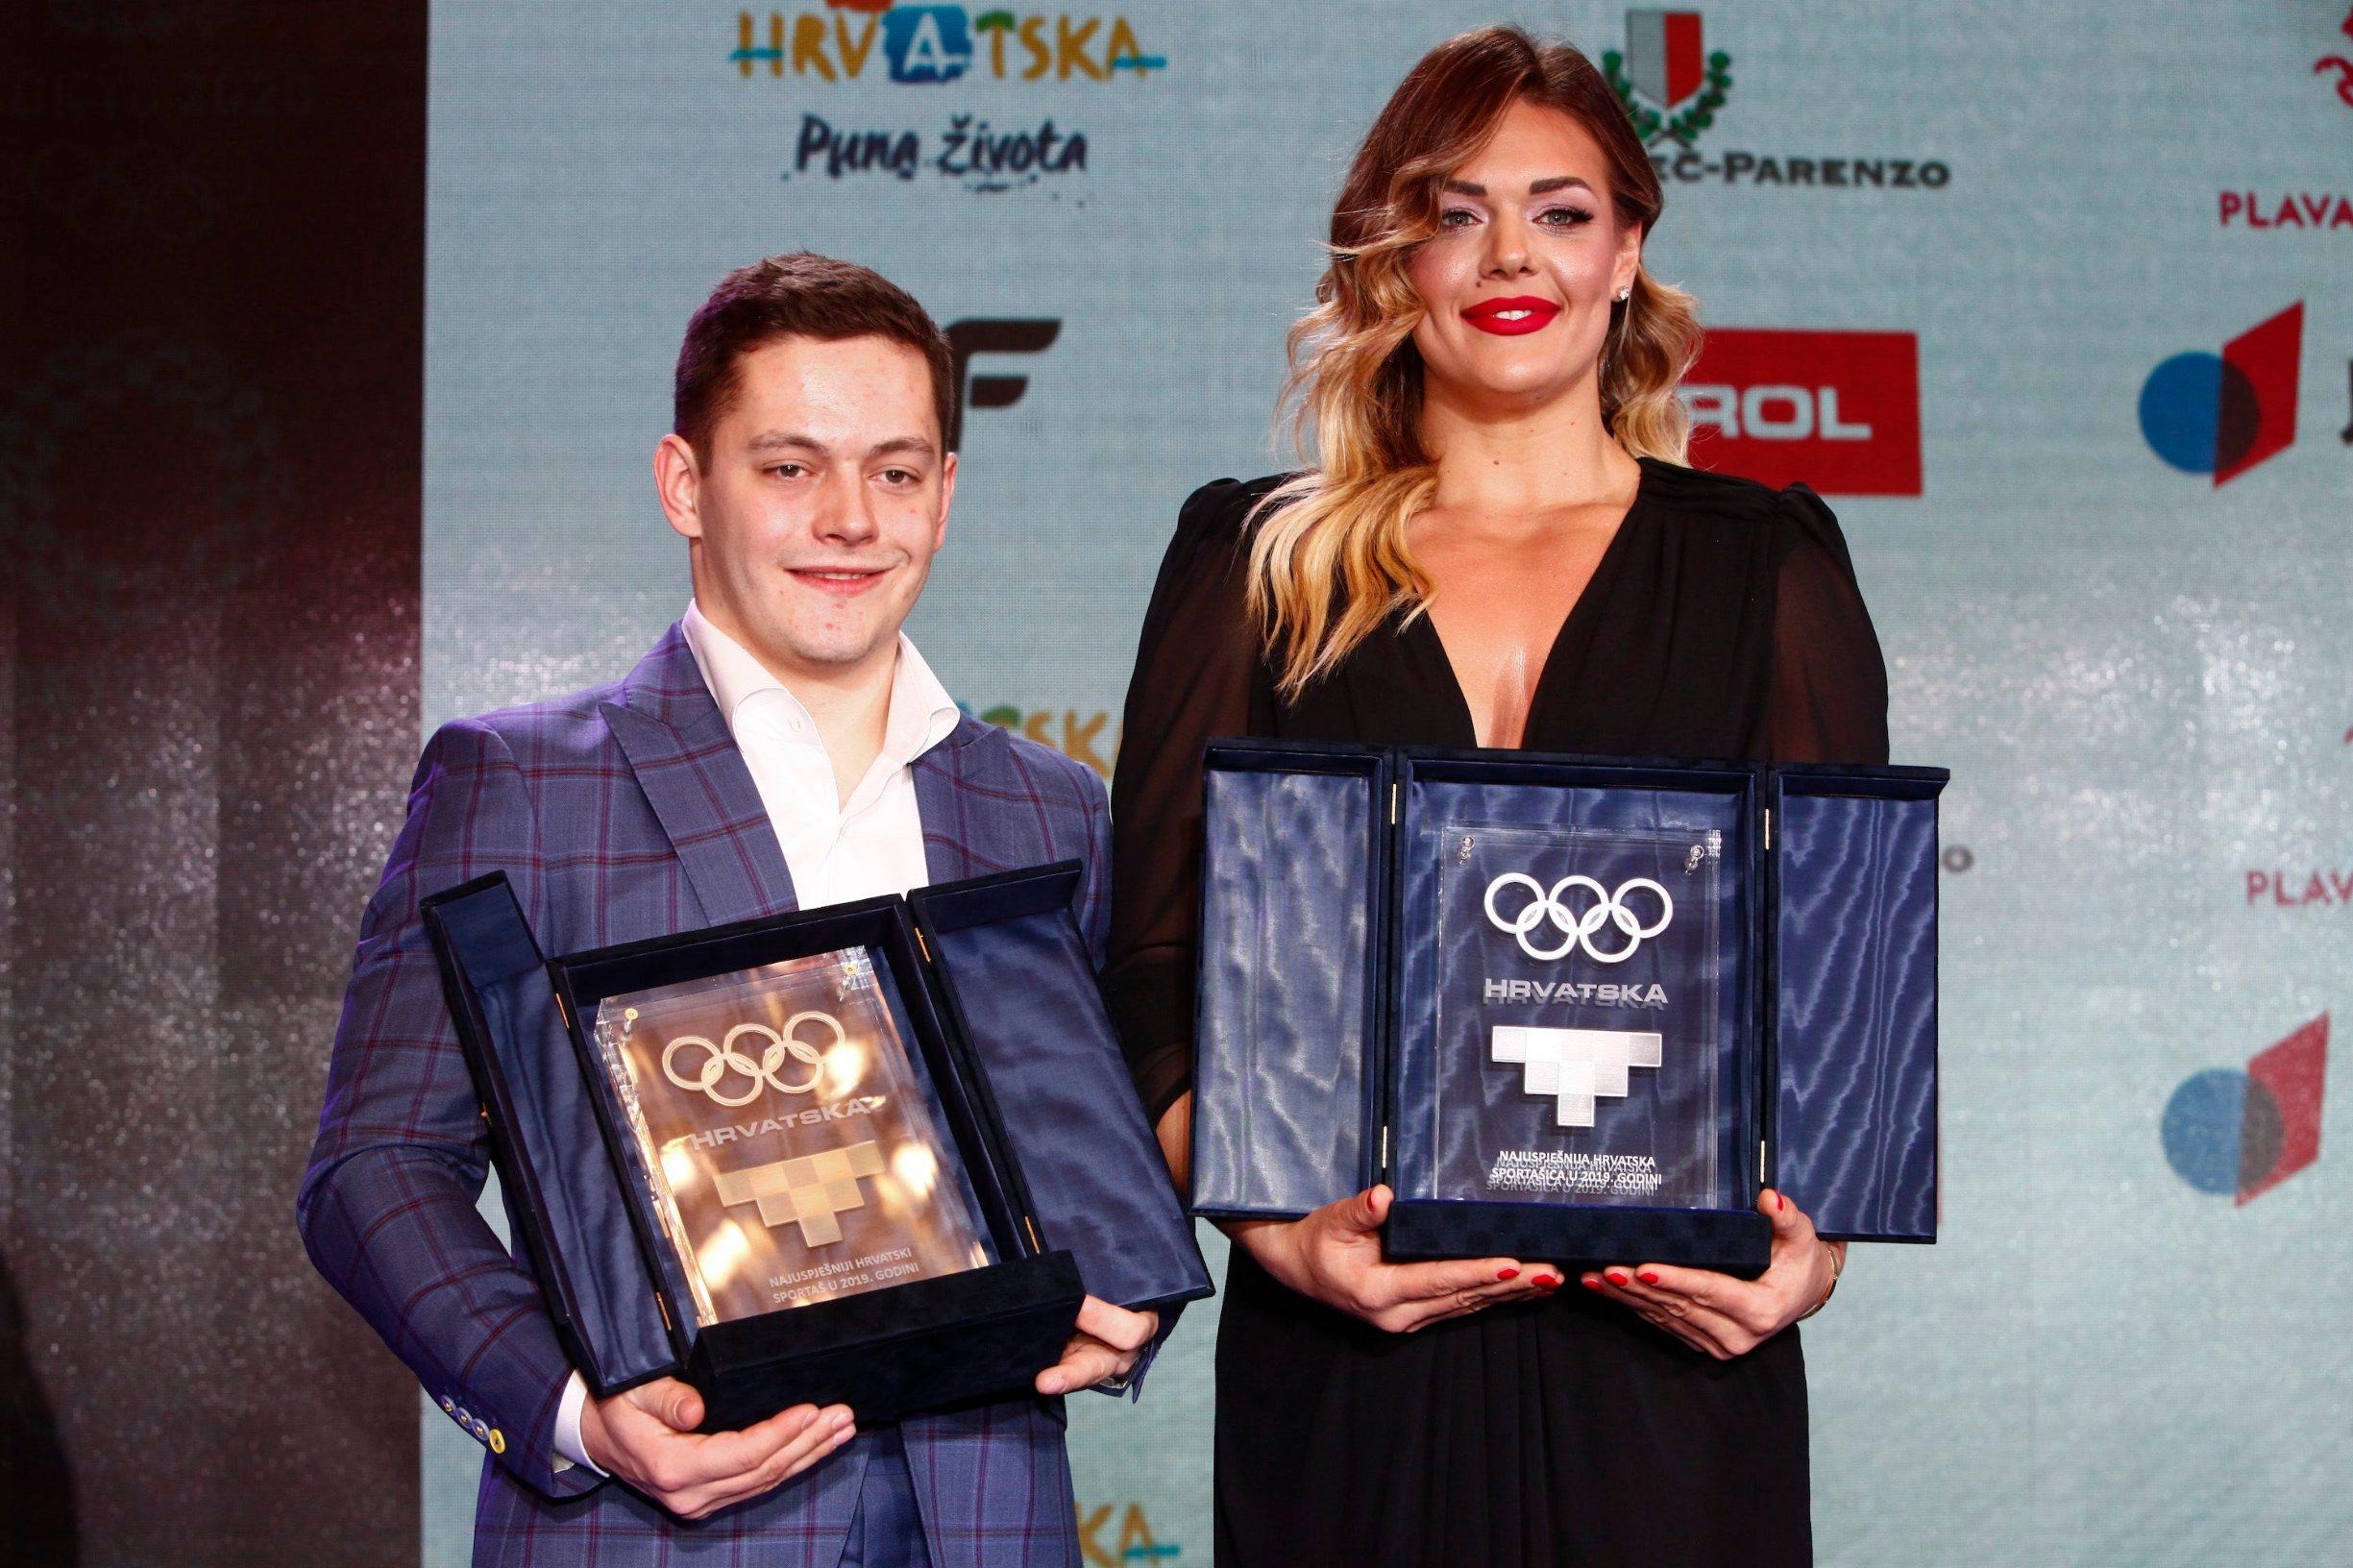 hoo_nagrade30-191219